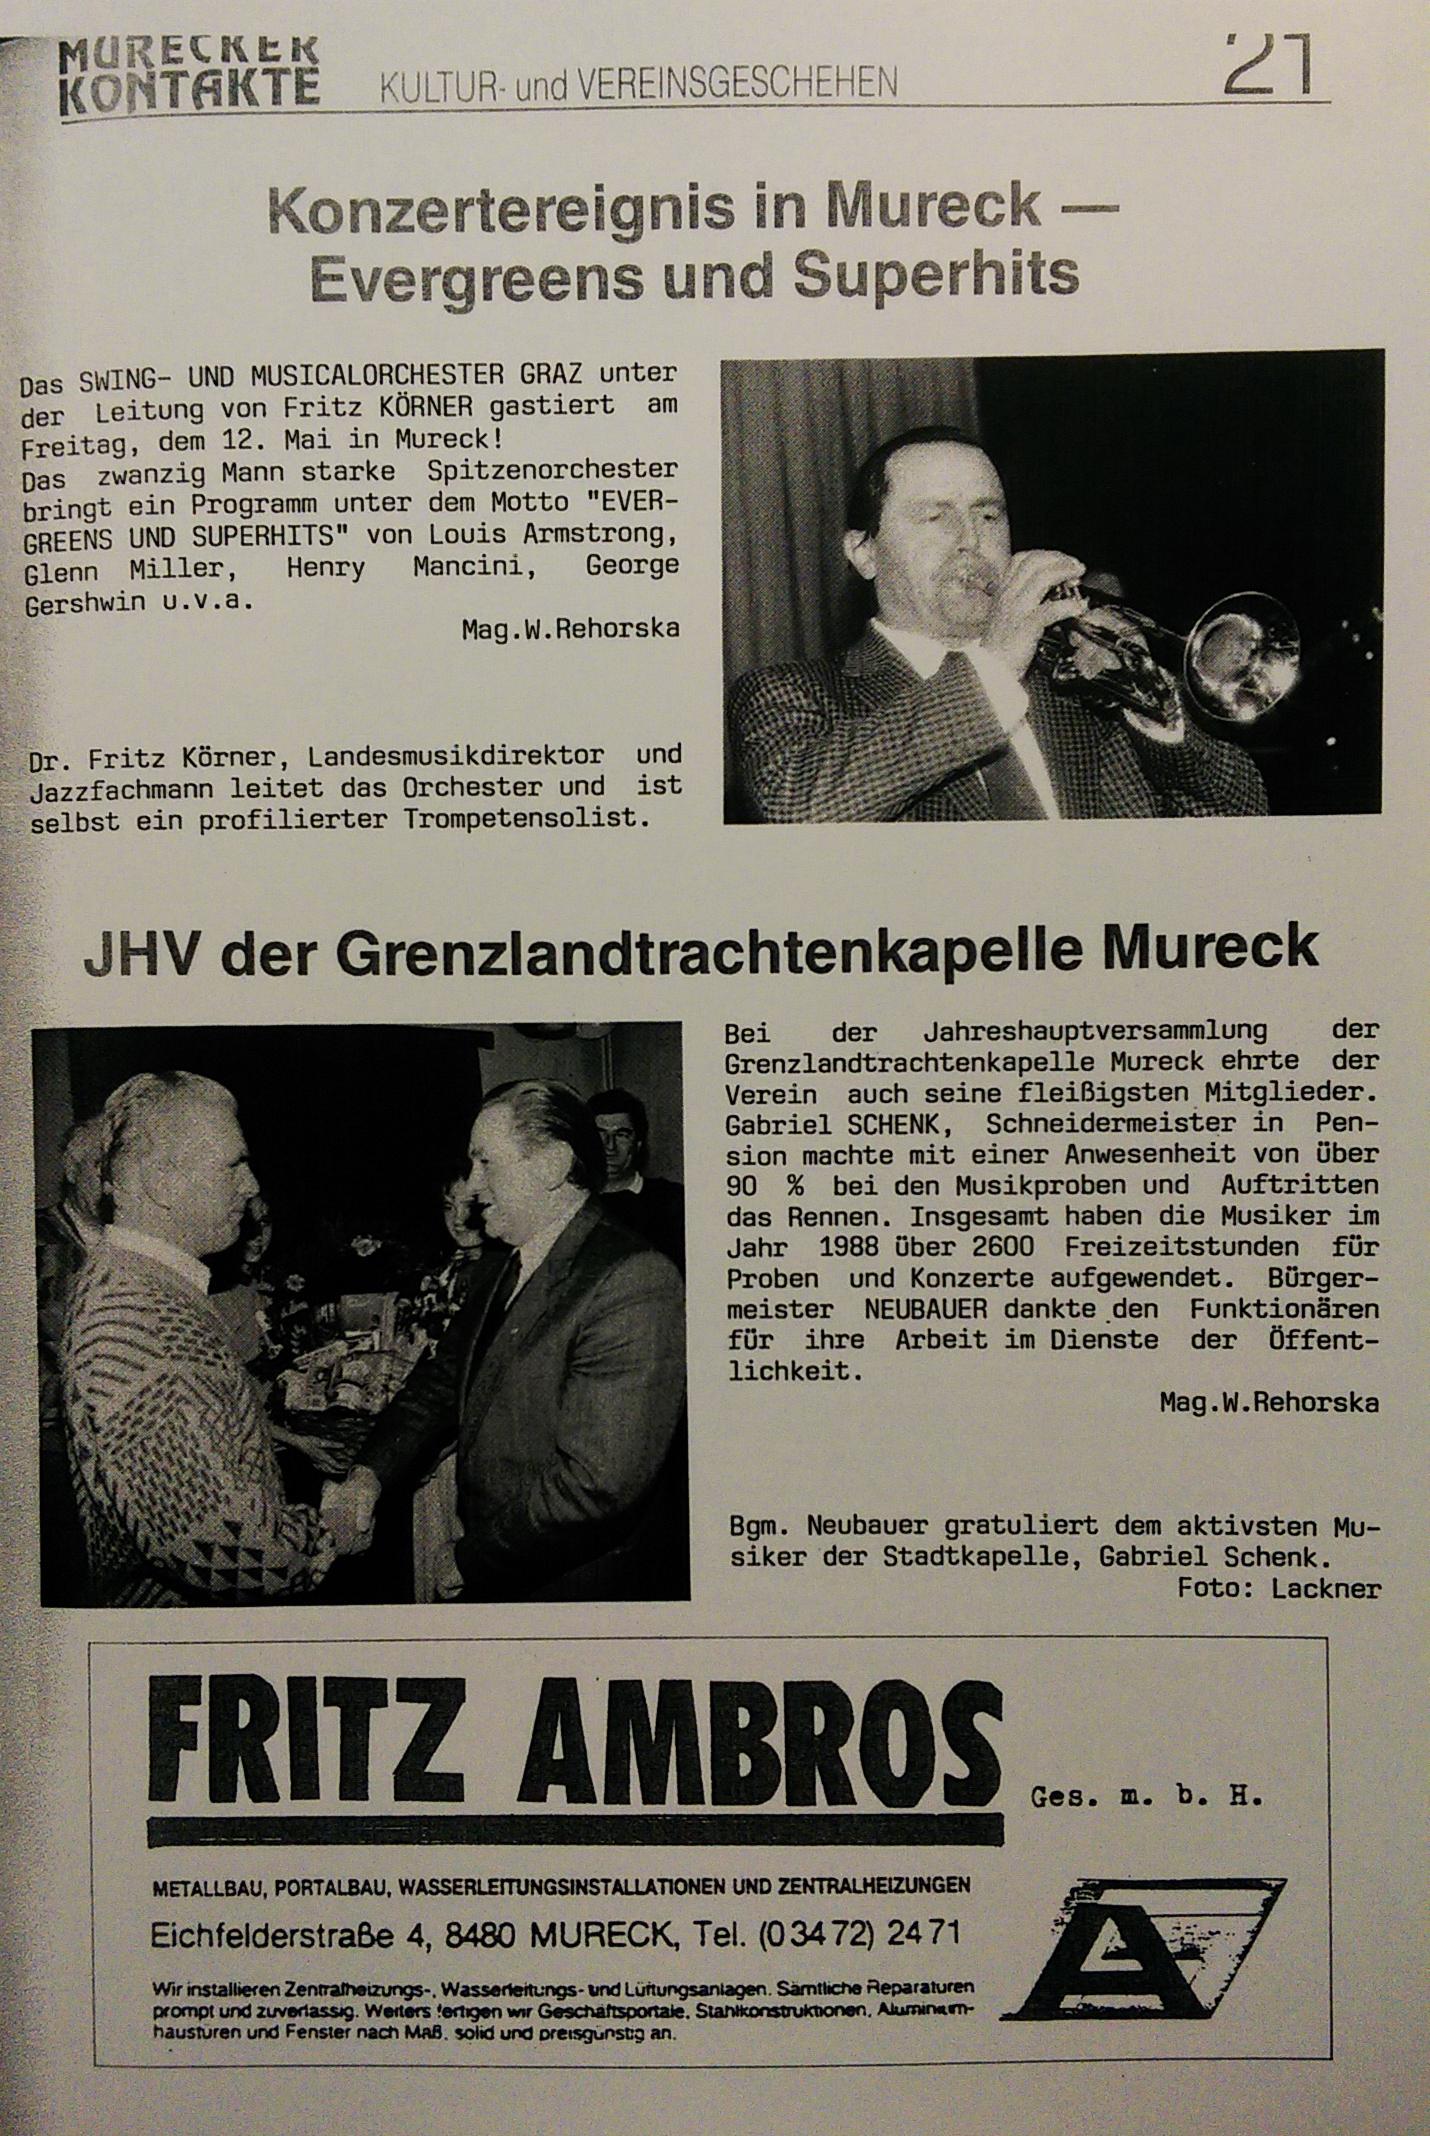 1989 Murecker Kontakte JHV